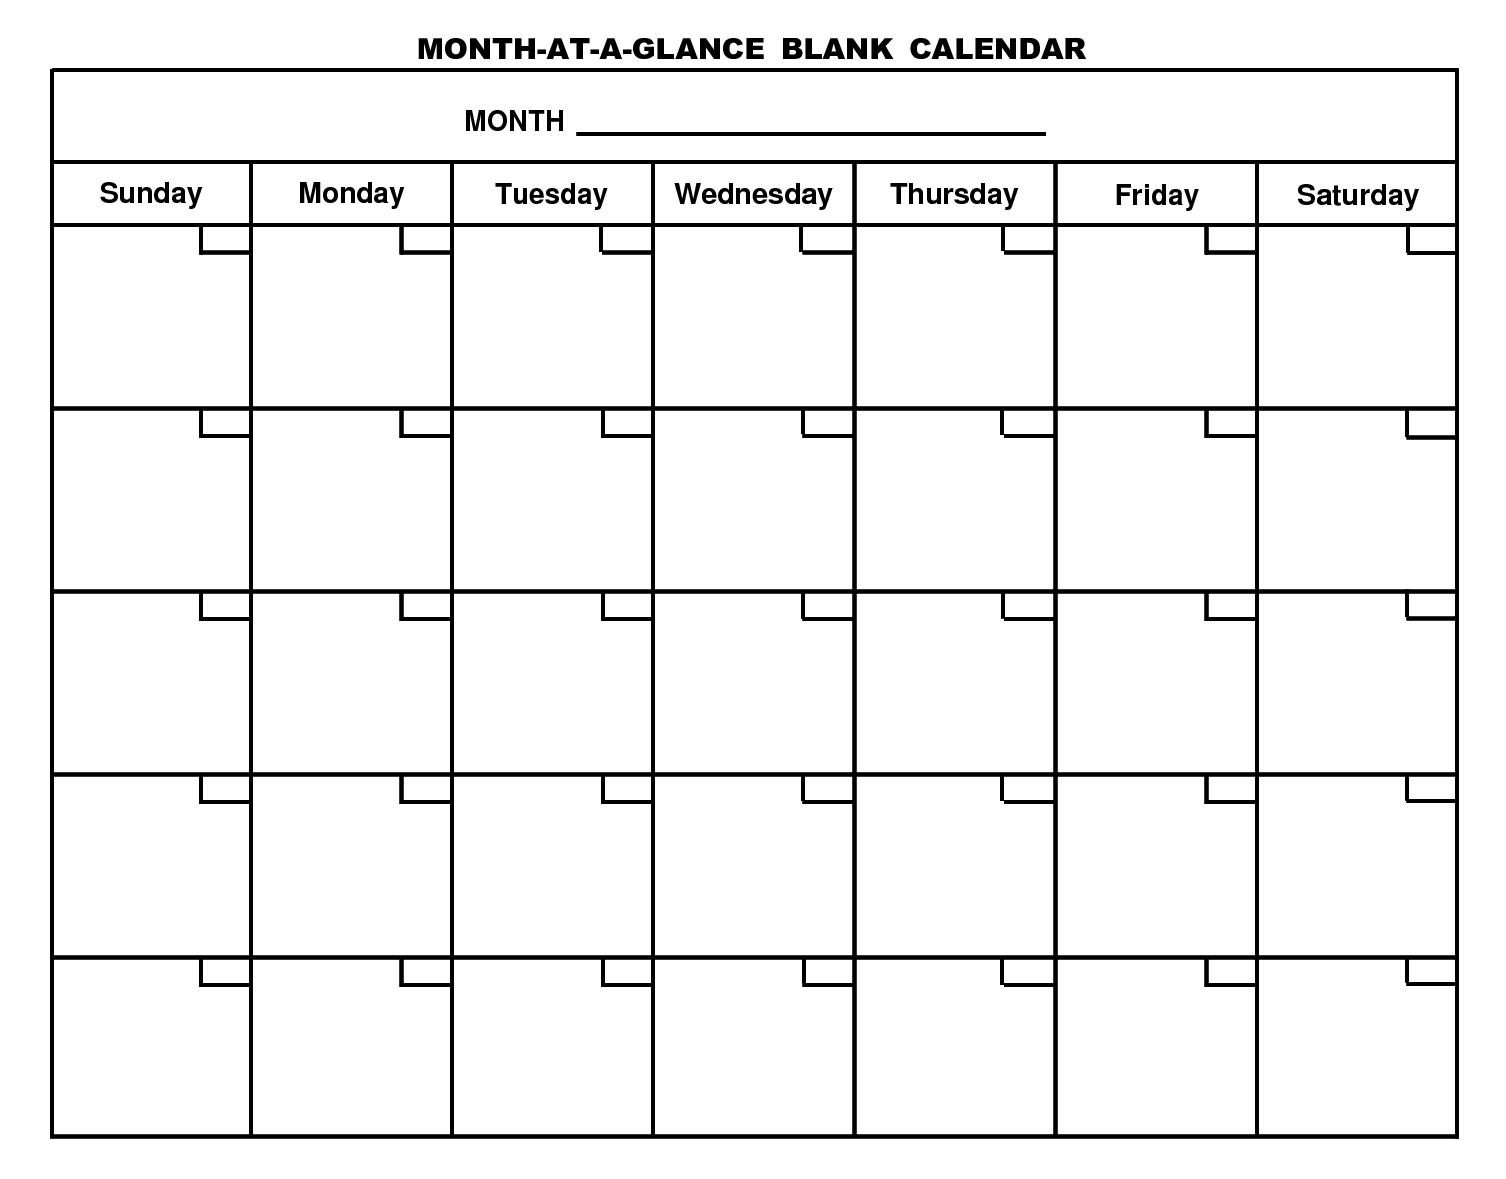 Calendar Month At A Glance • Printable Blank Calendar Template-Month At A Glance Blank Calendar Template